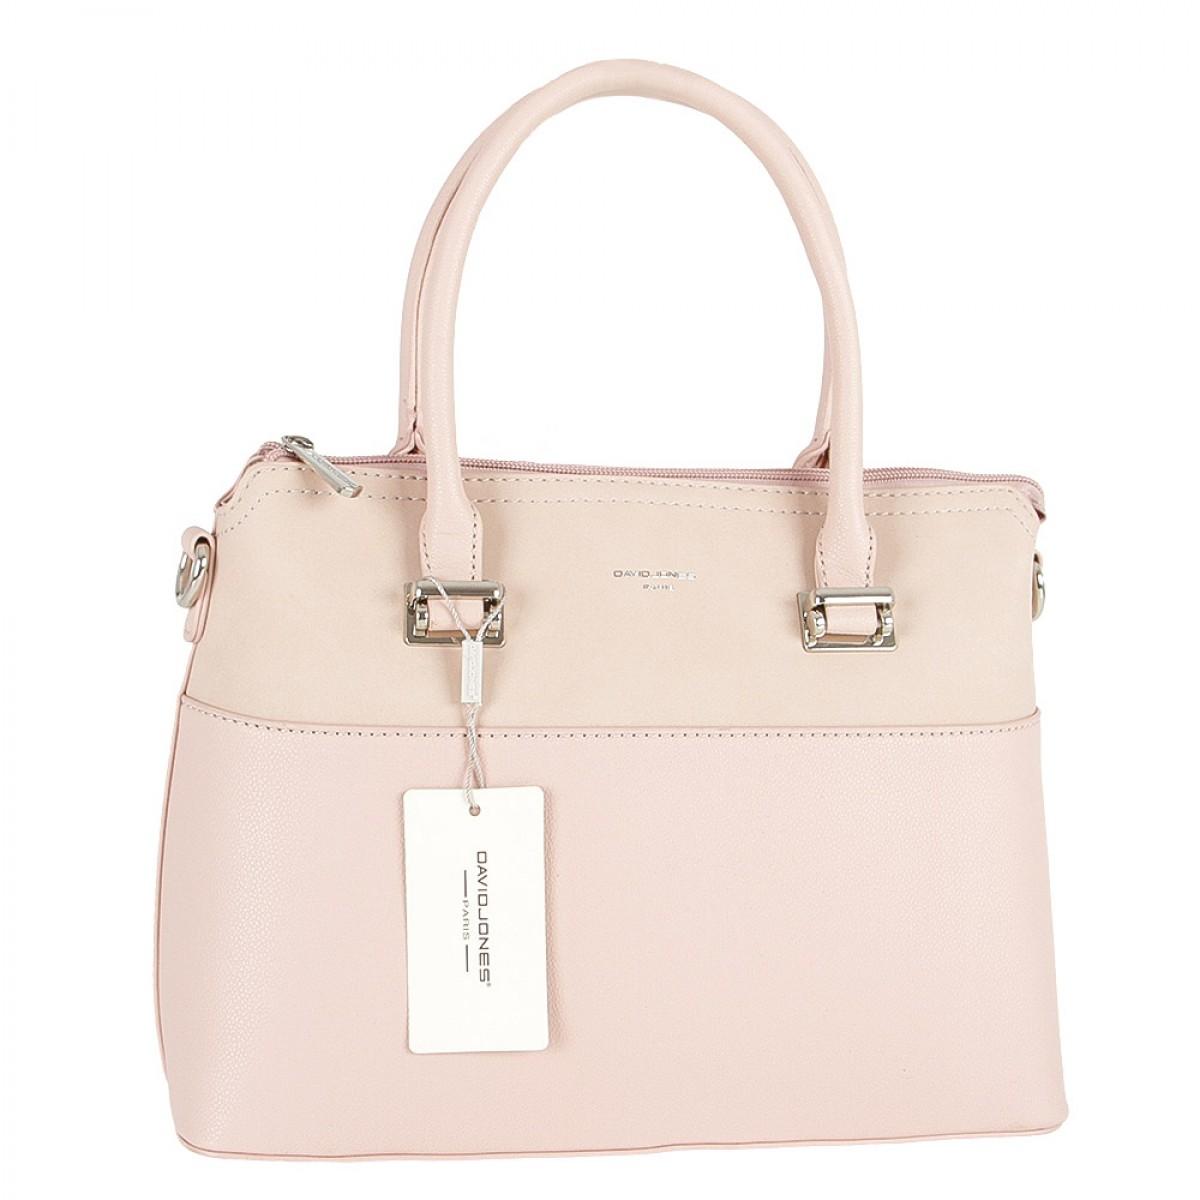 Жіноча сумка David Jones 5909-2 PINK